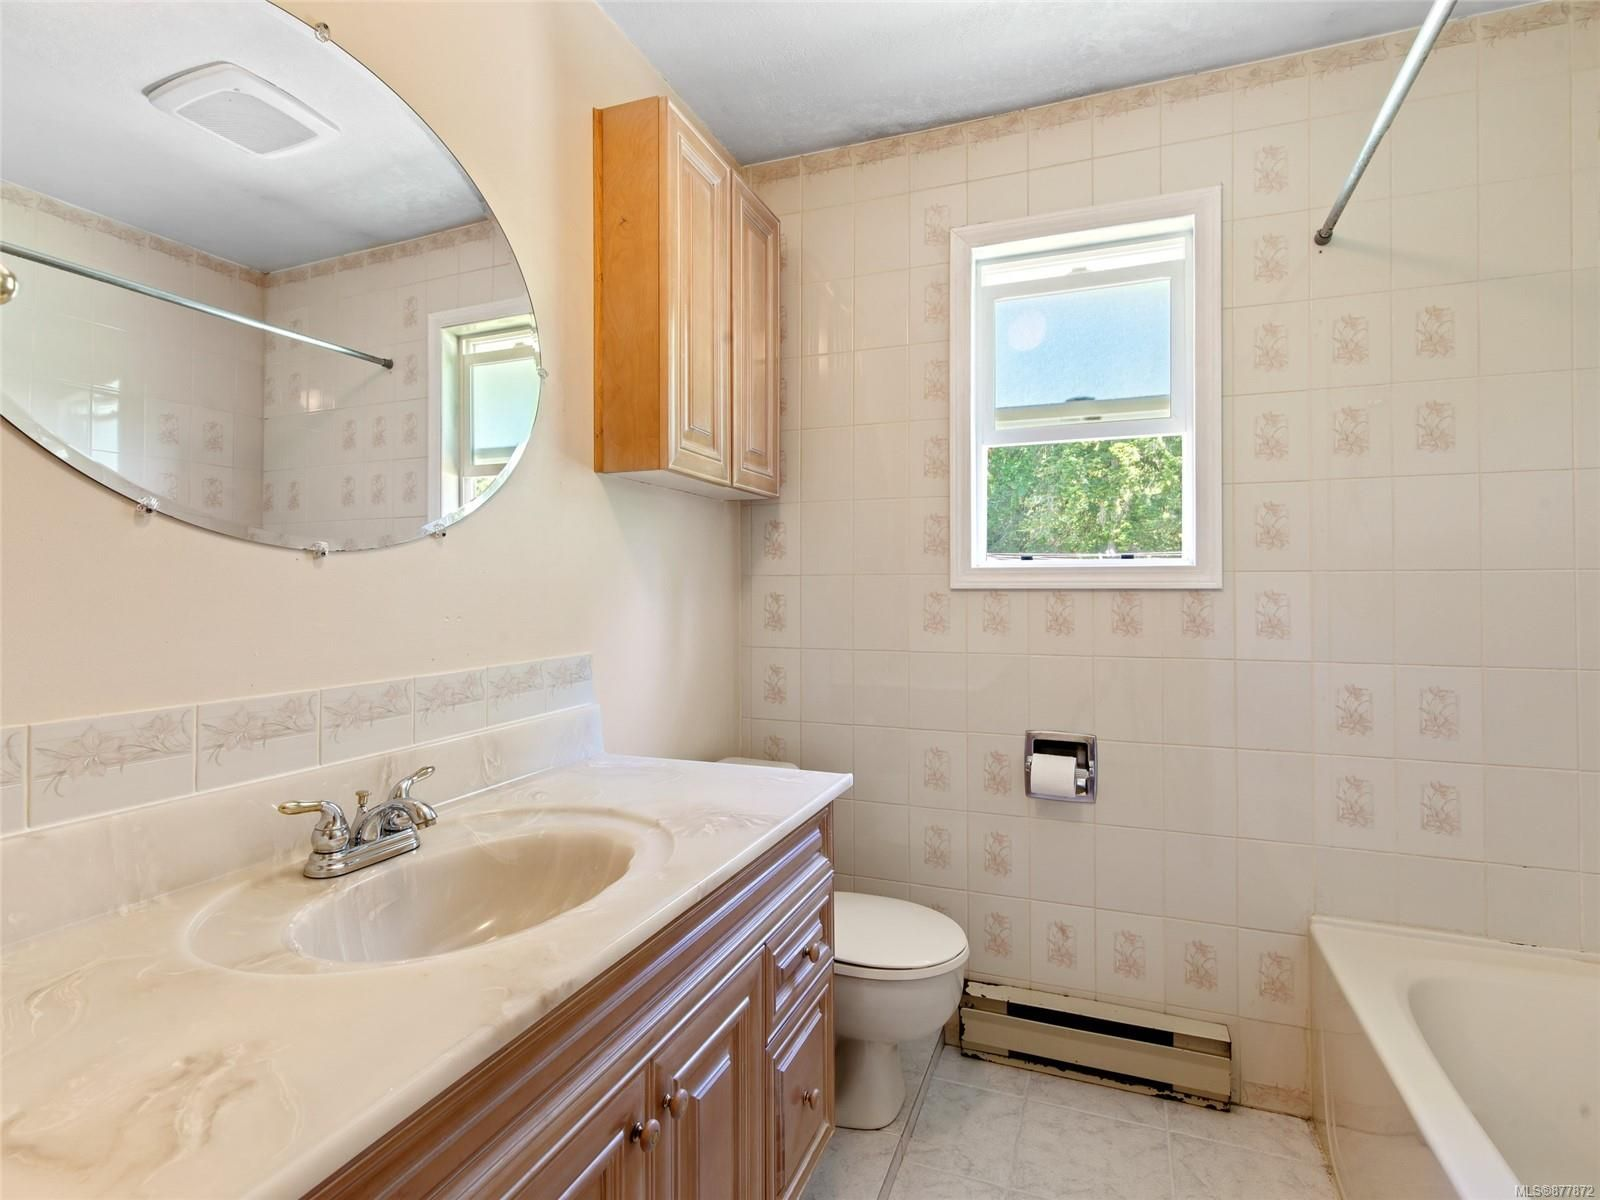 Photo 21: Photos: 7865 Wardrop Rd in : PA Port Alberni House for sale (Port Alberni)  : MLS®# 877872